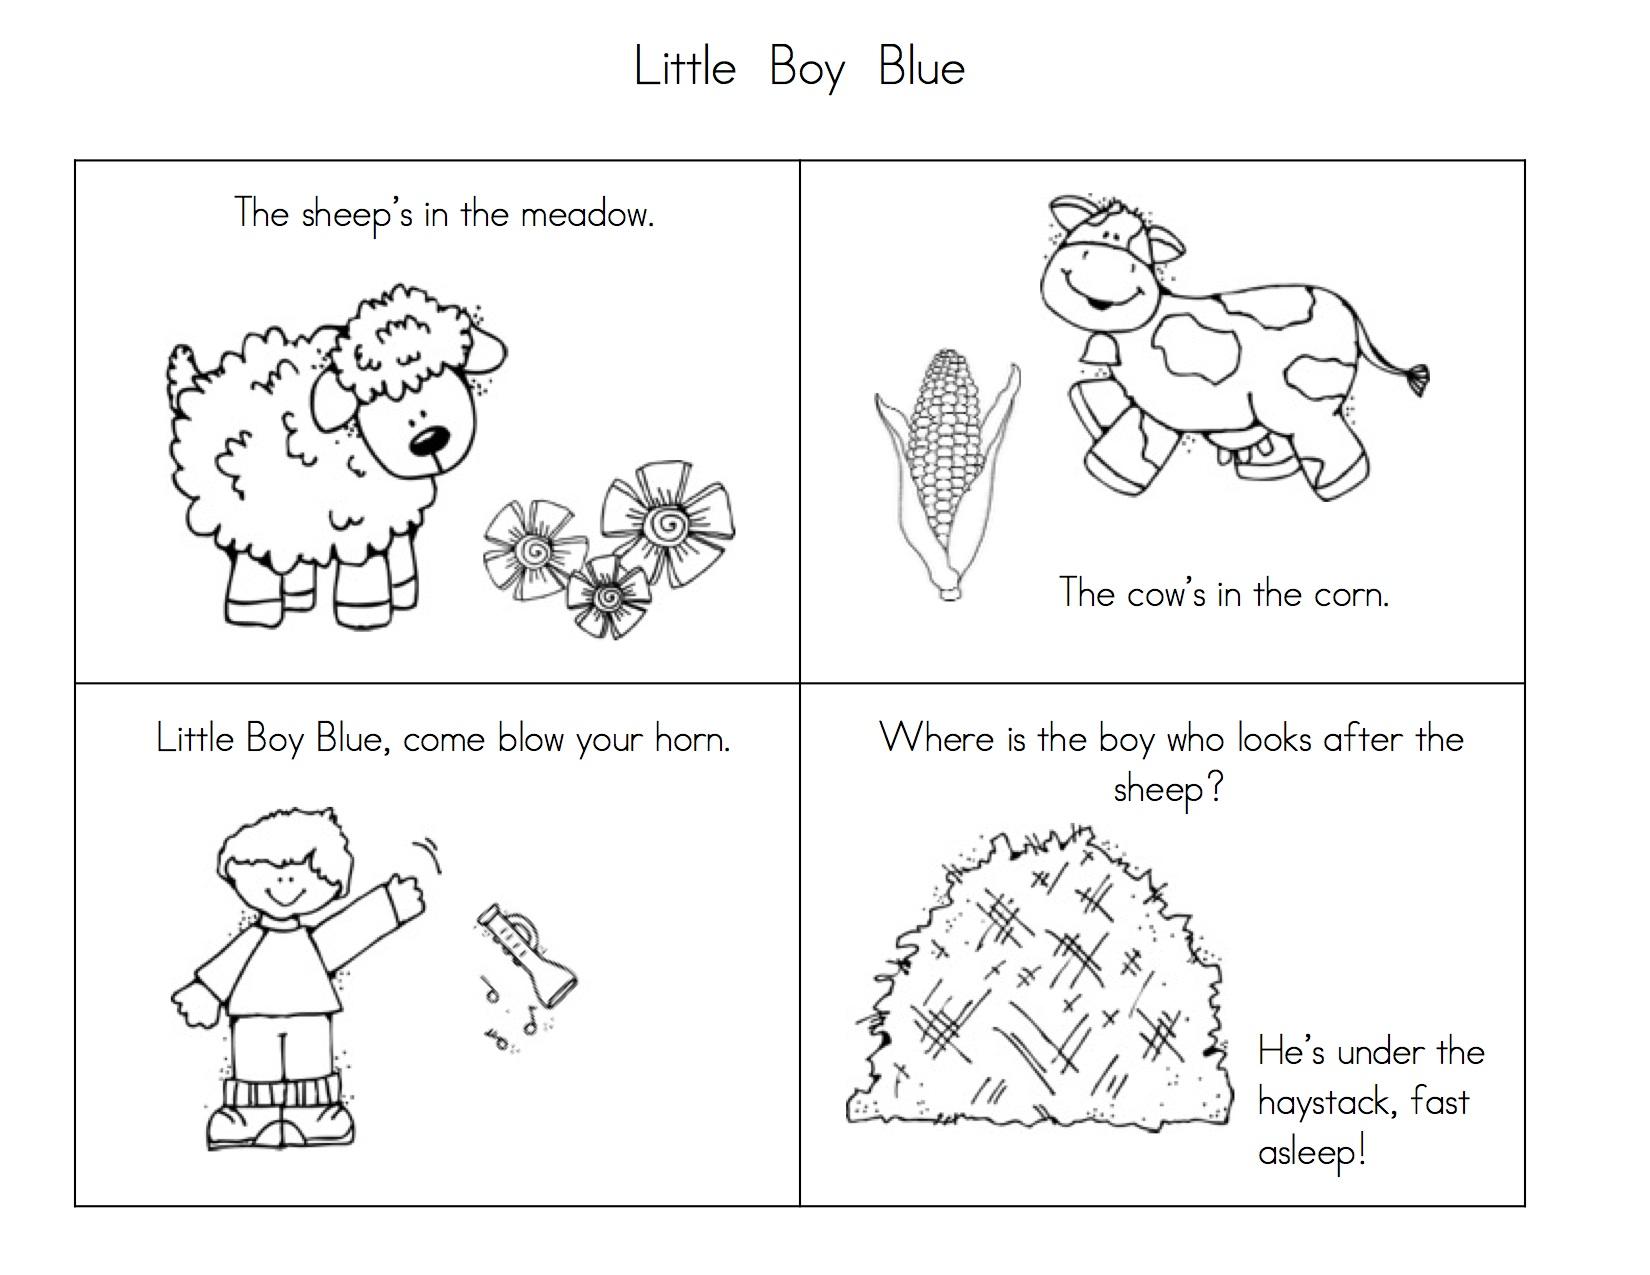 little boy blue seq jack and jill nursery rhyme clipart jack and jill clipart free